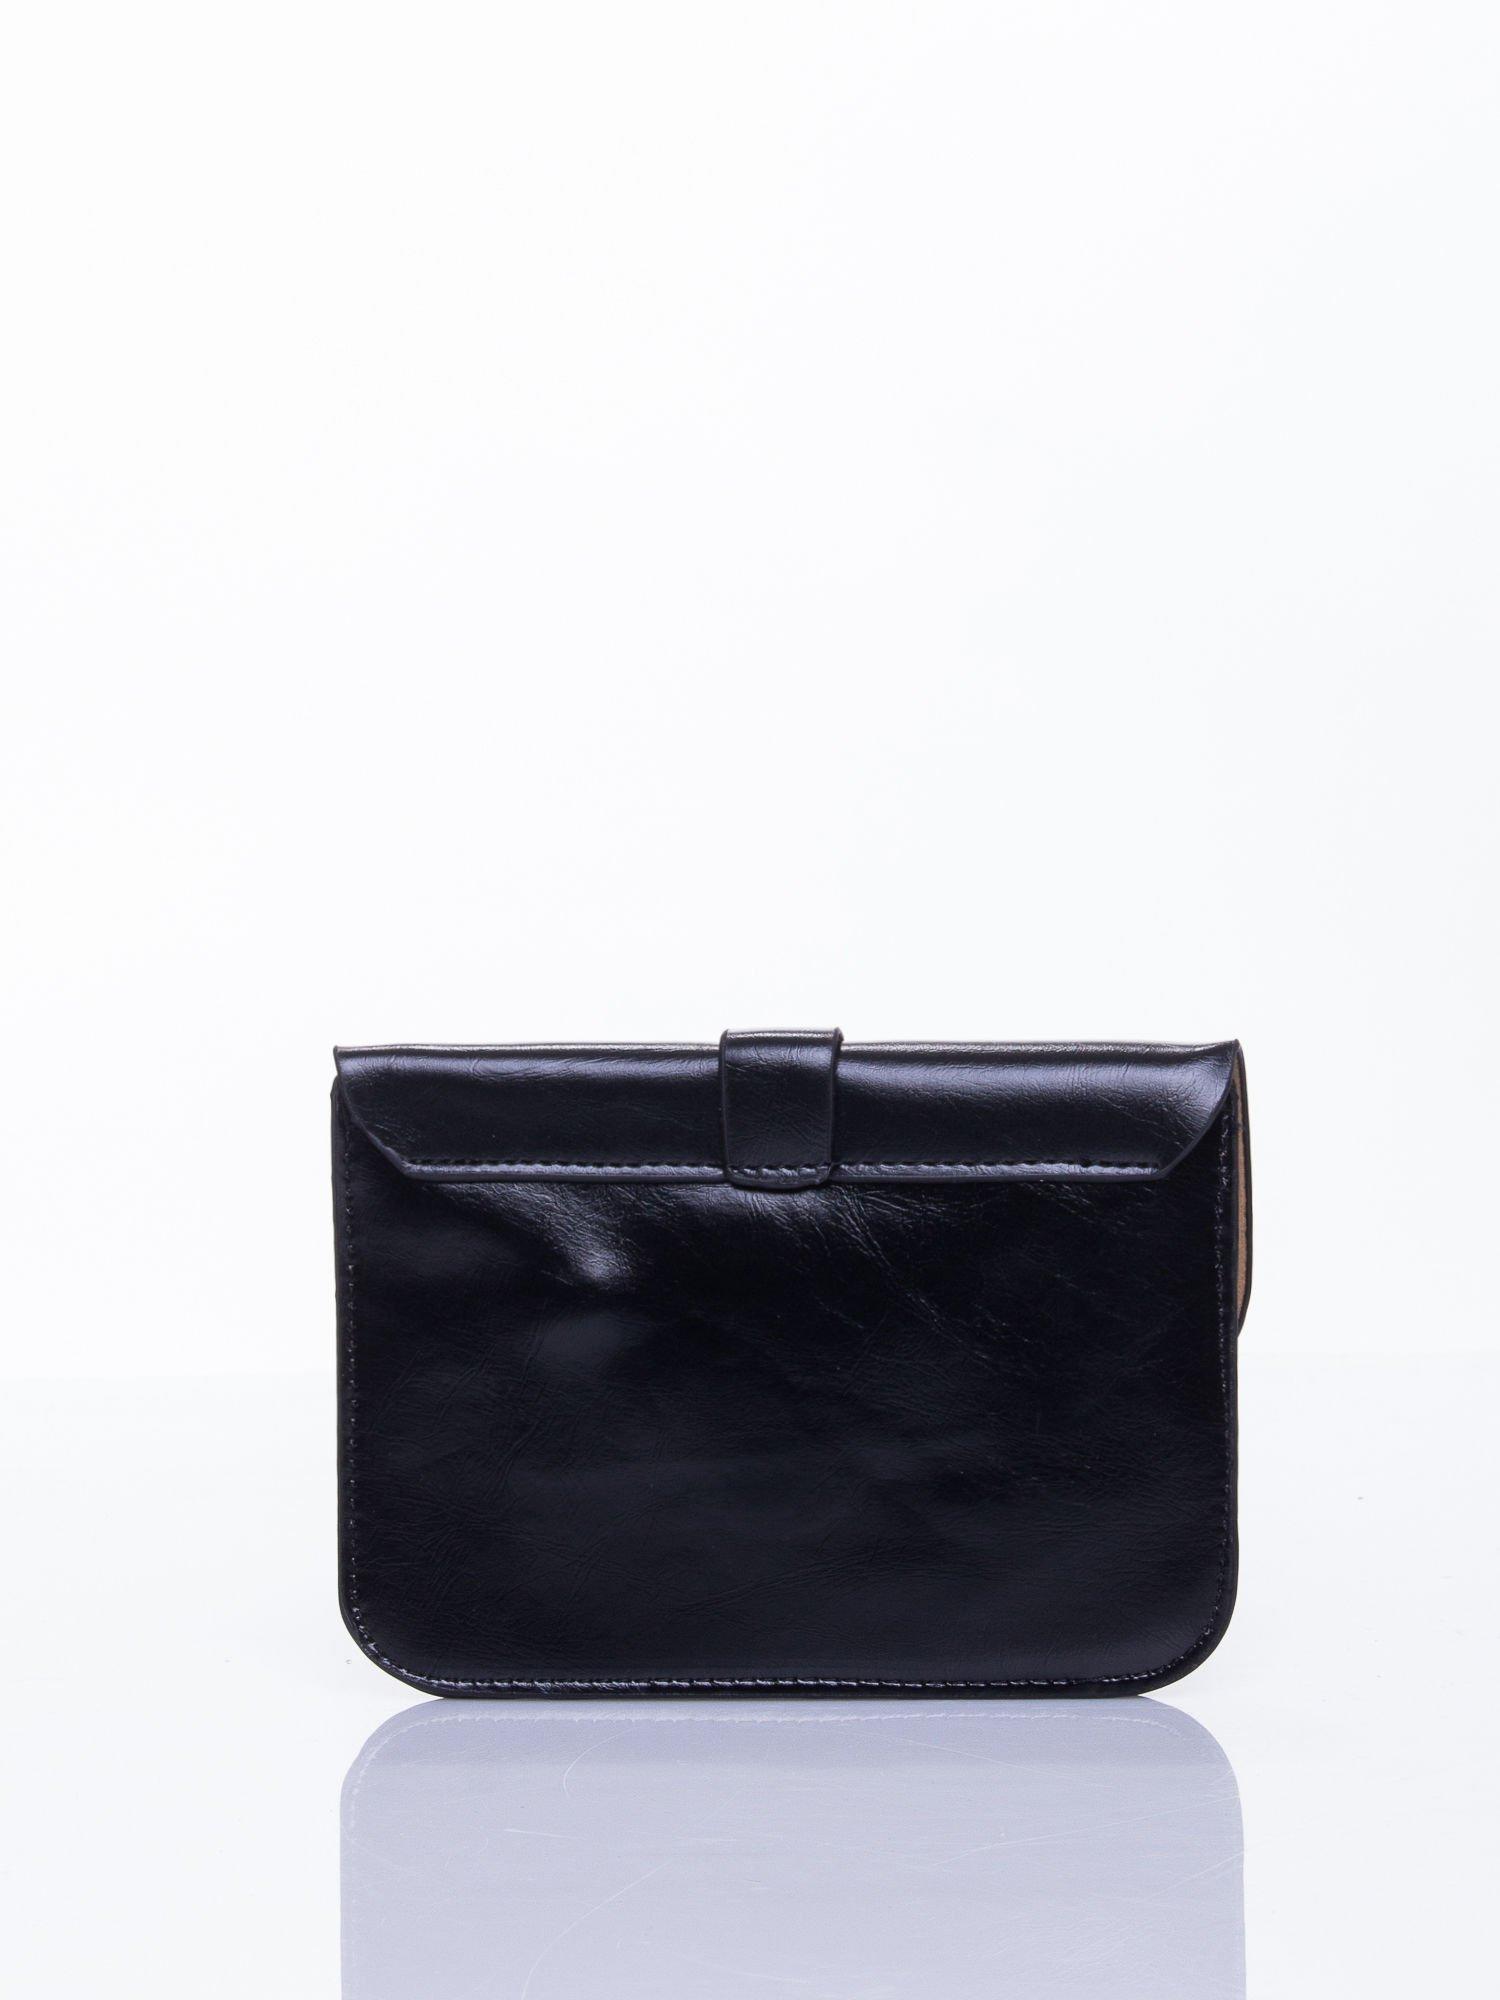 Czarna torebka listonoszka z klapką                                  zdj.                                  3